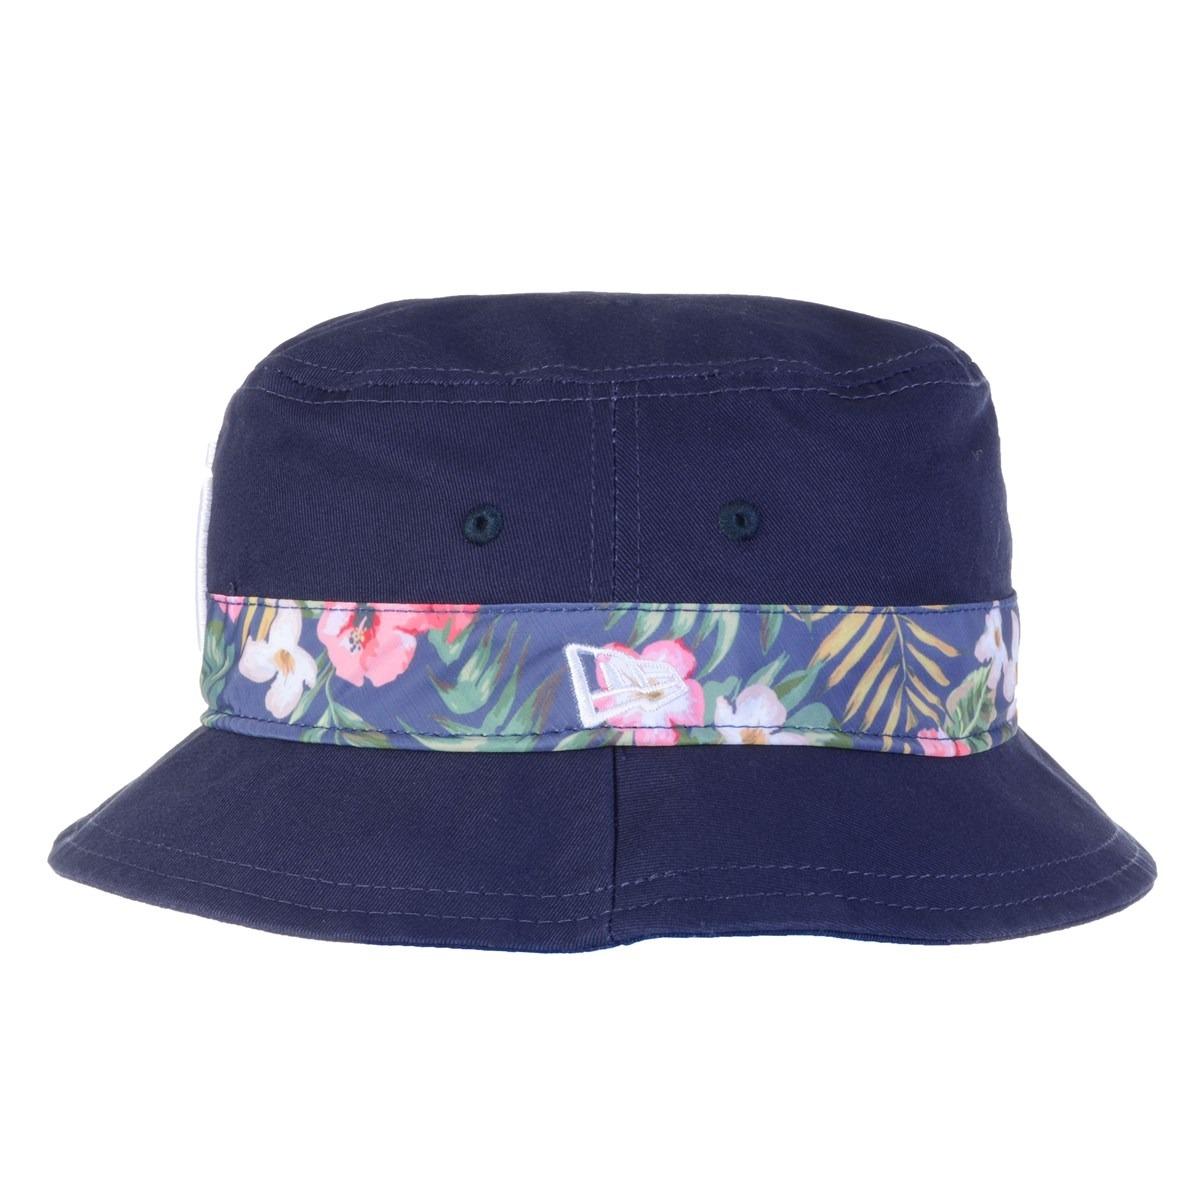 c591ed73a8 Chapéu Masculino New Era Bucket Print Vibe - Cor: Azul - Tam